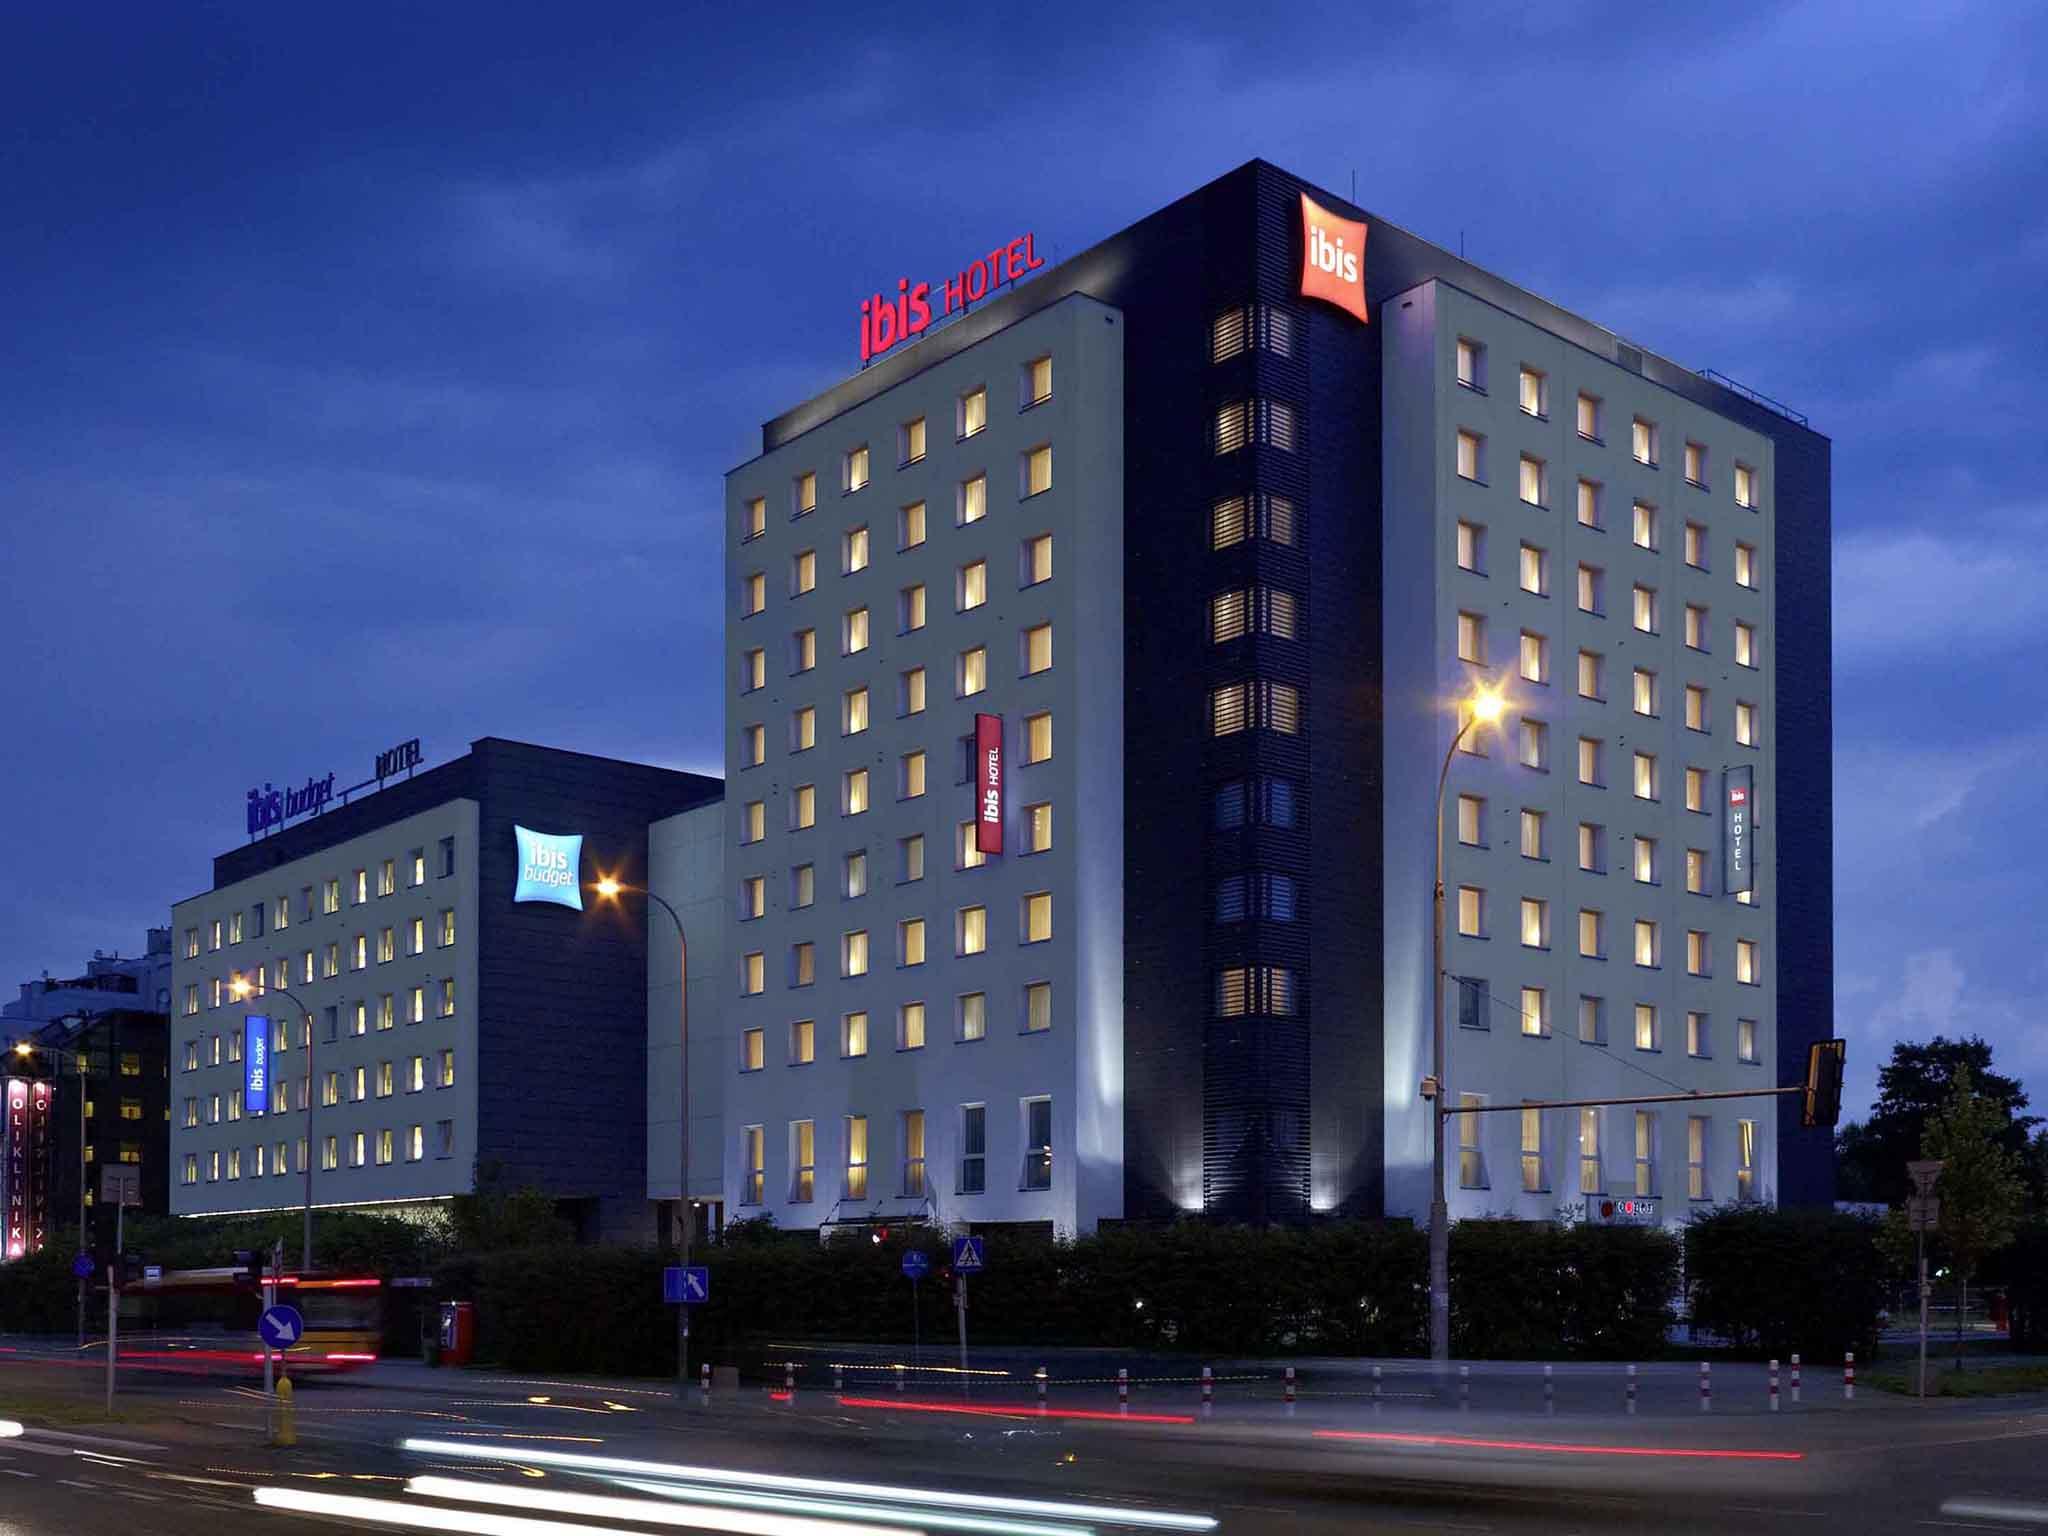 Ibis Hotel Warszawa Centrum